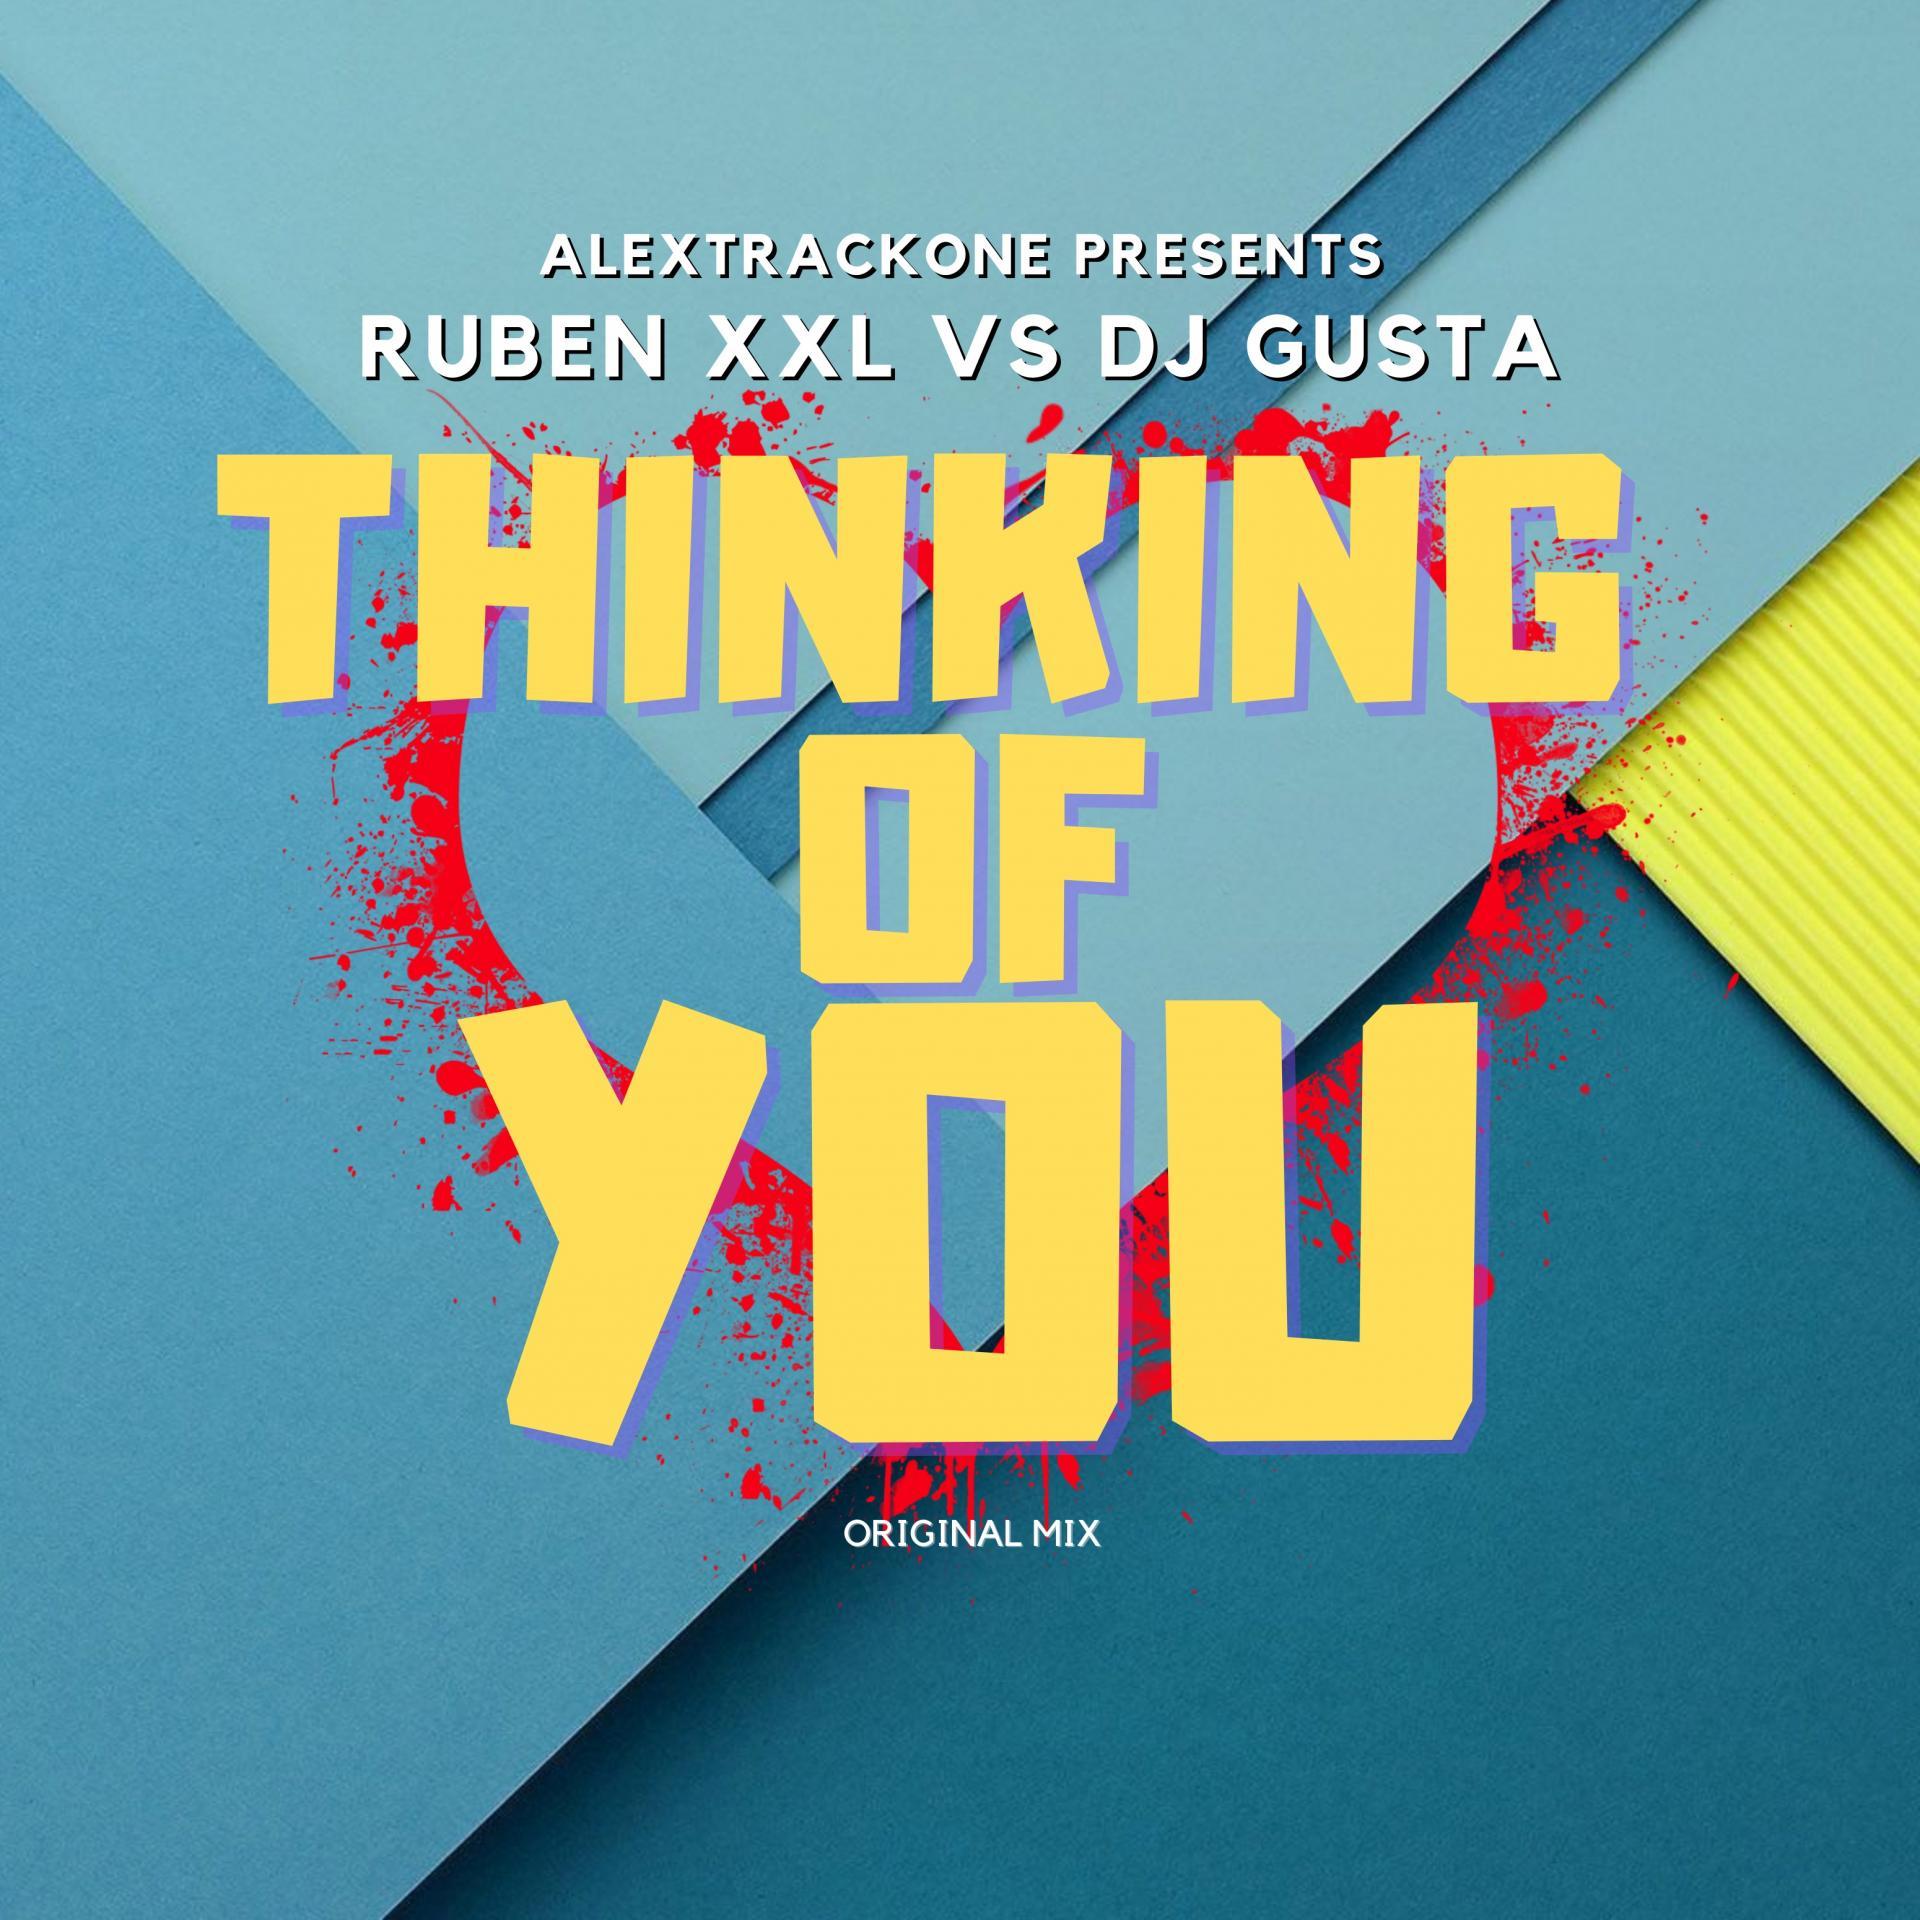 THINKING OF YOU (CON RUBEN XXL & DJ GUSTA) -ORIGINAL MIX-